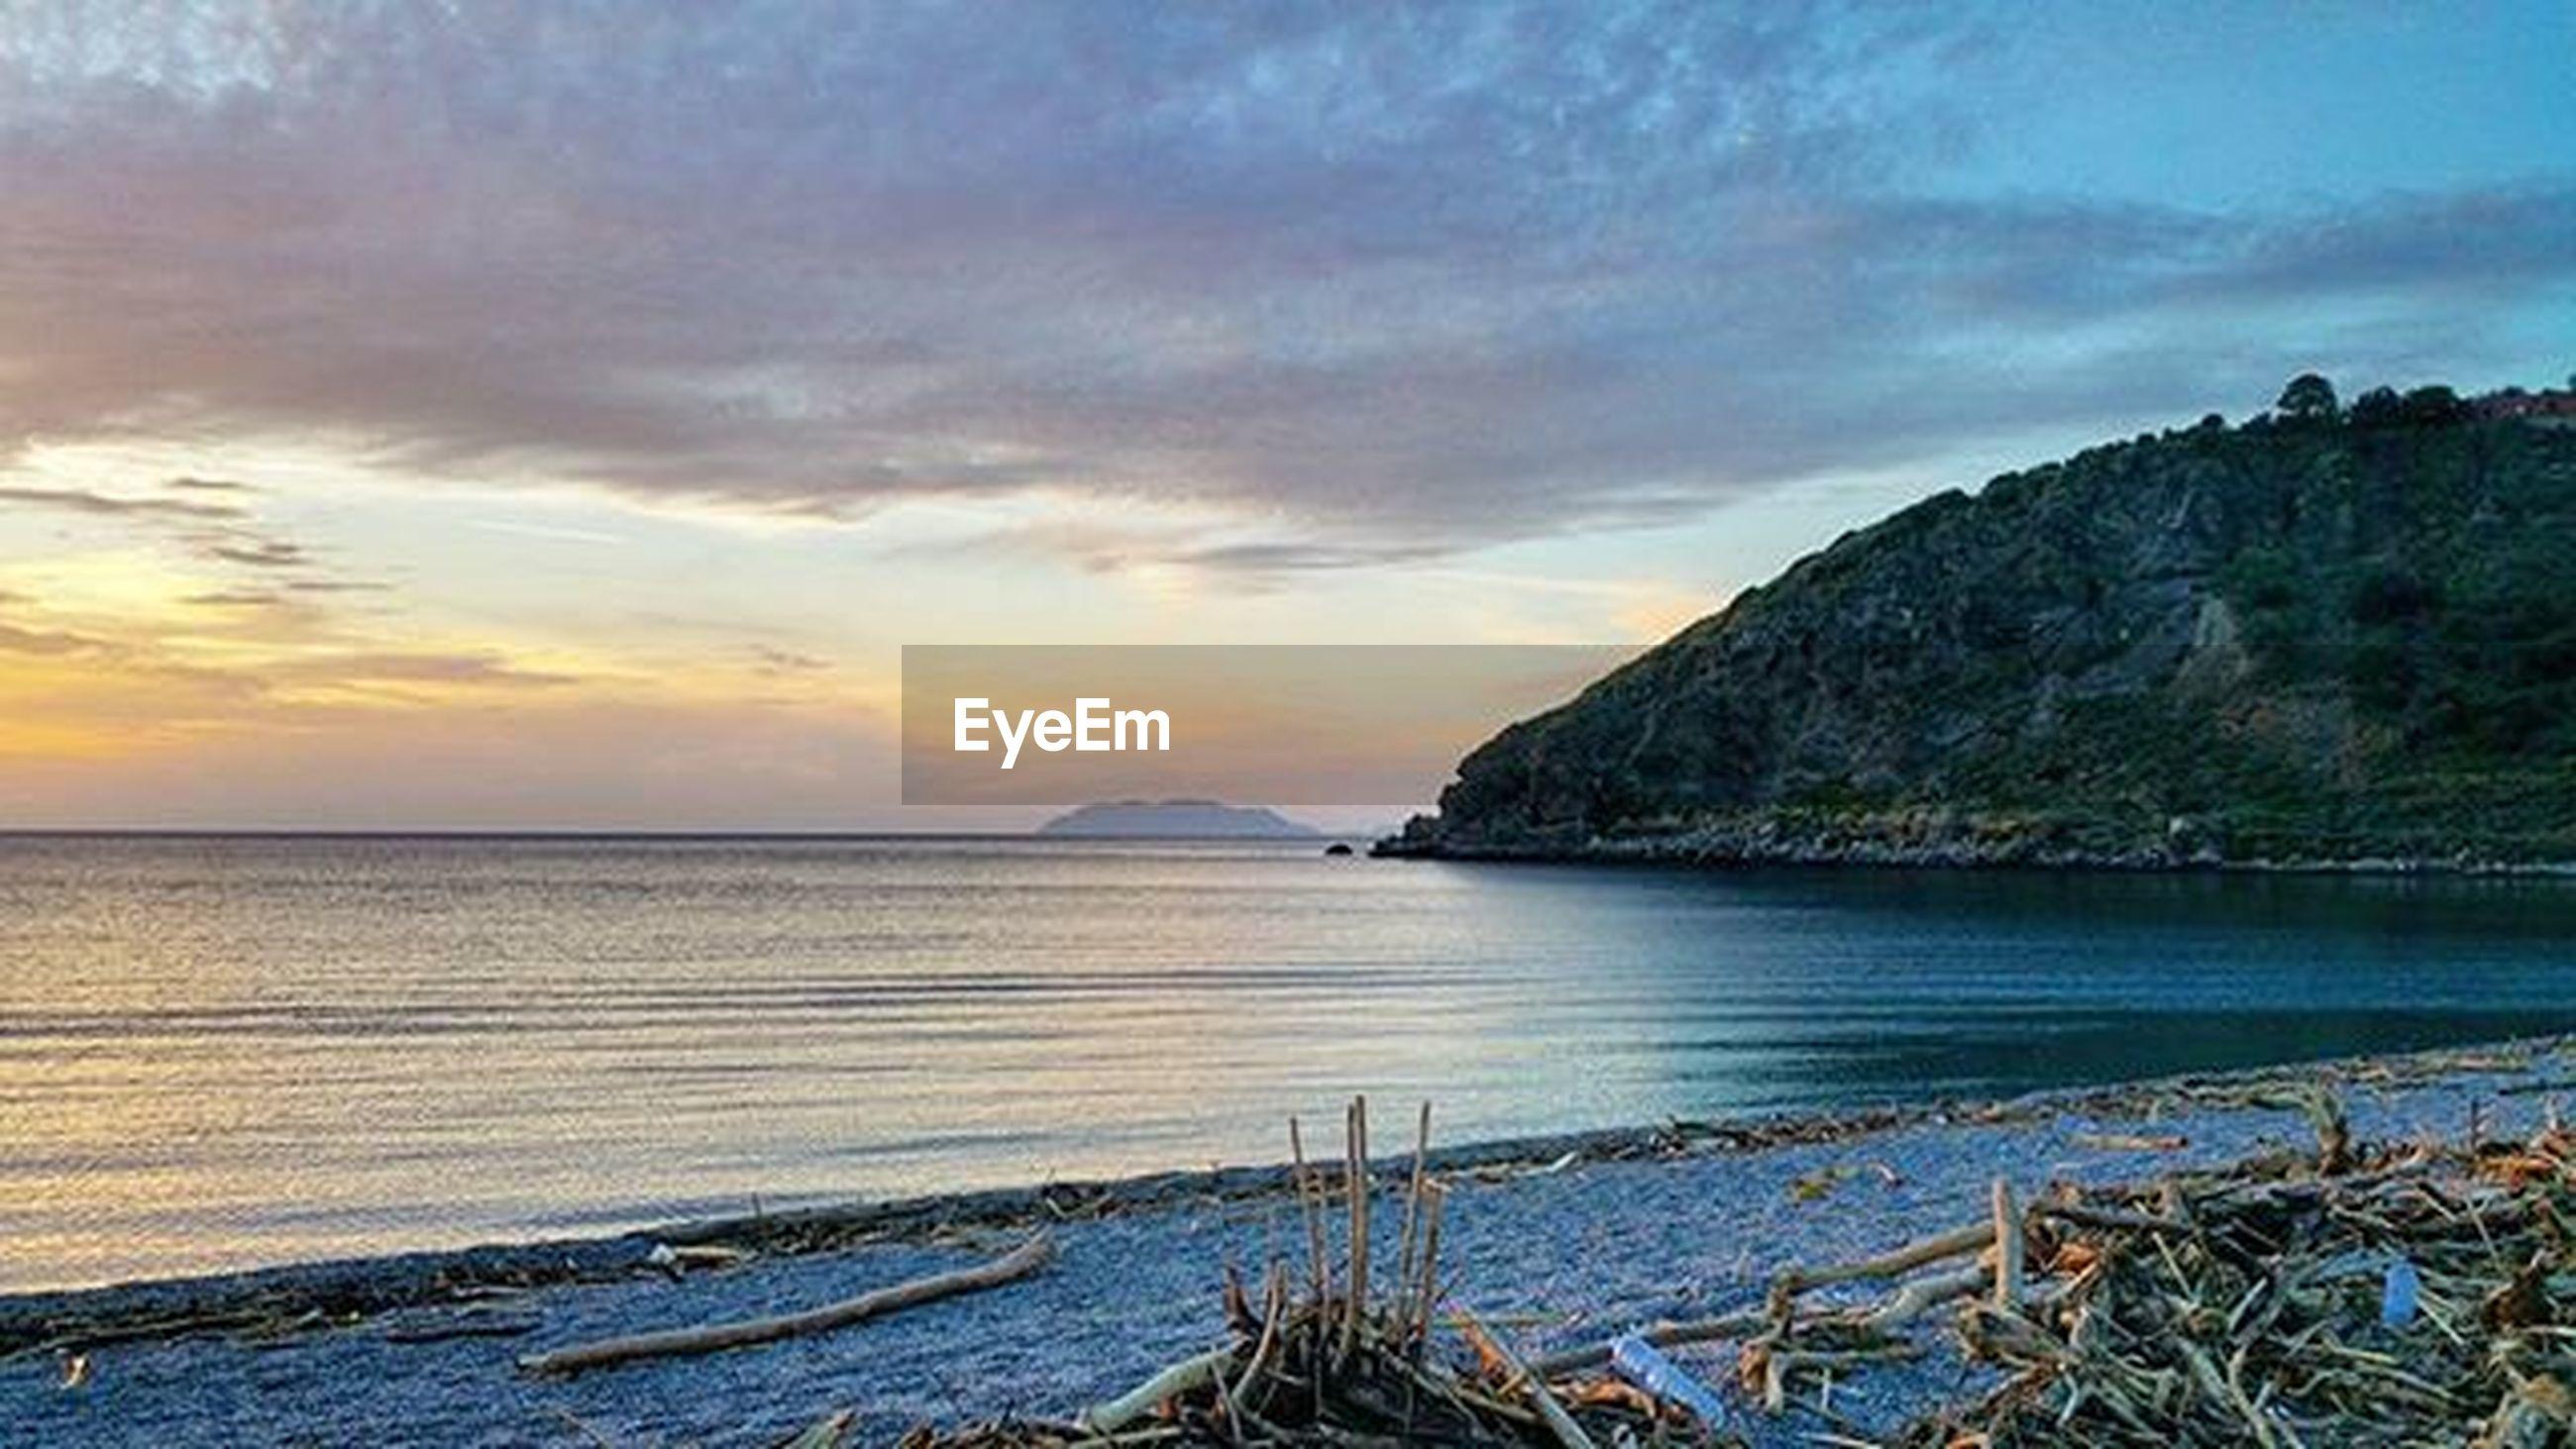 water, sea, tranquil scene, scenics, beauty in nature, tranquility, sky, horizon over water, sunset, nature, mountain, idyllic, cloud - sky, beach, cloud, shore, coastline, outdoors, rock - object, non-urban scene